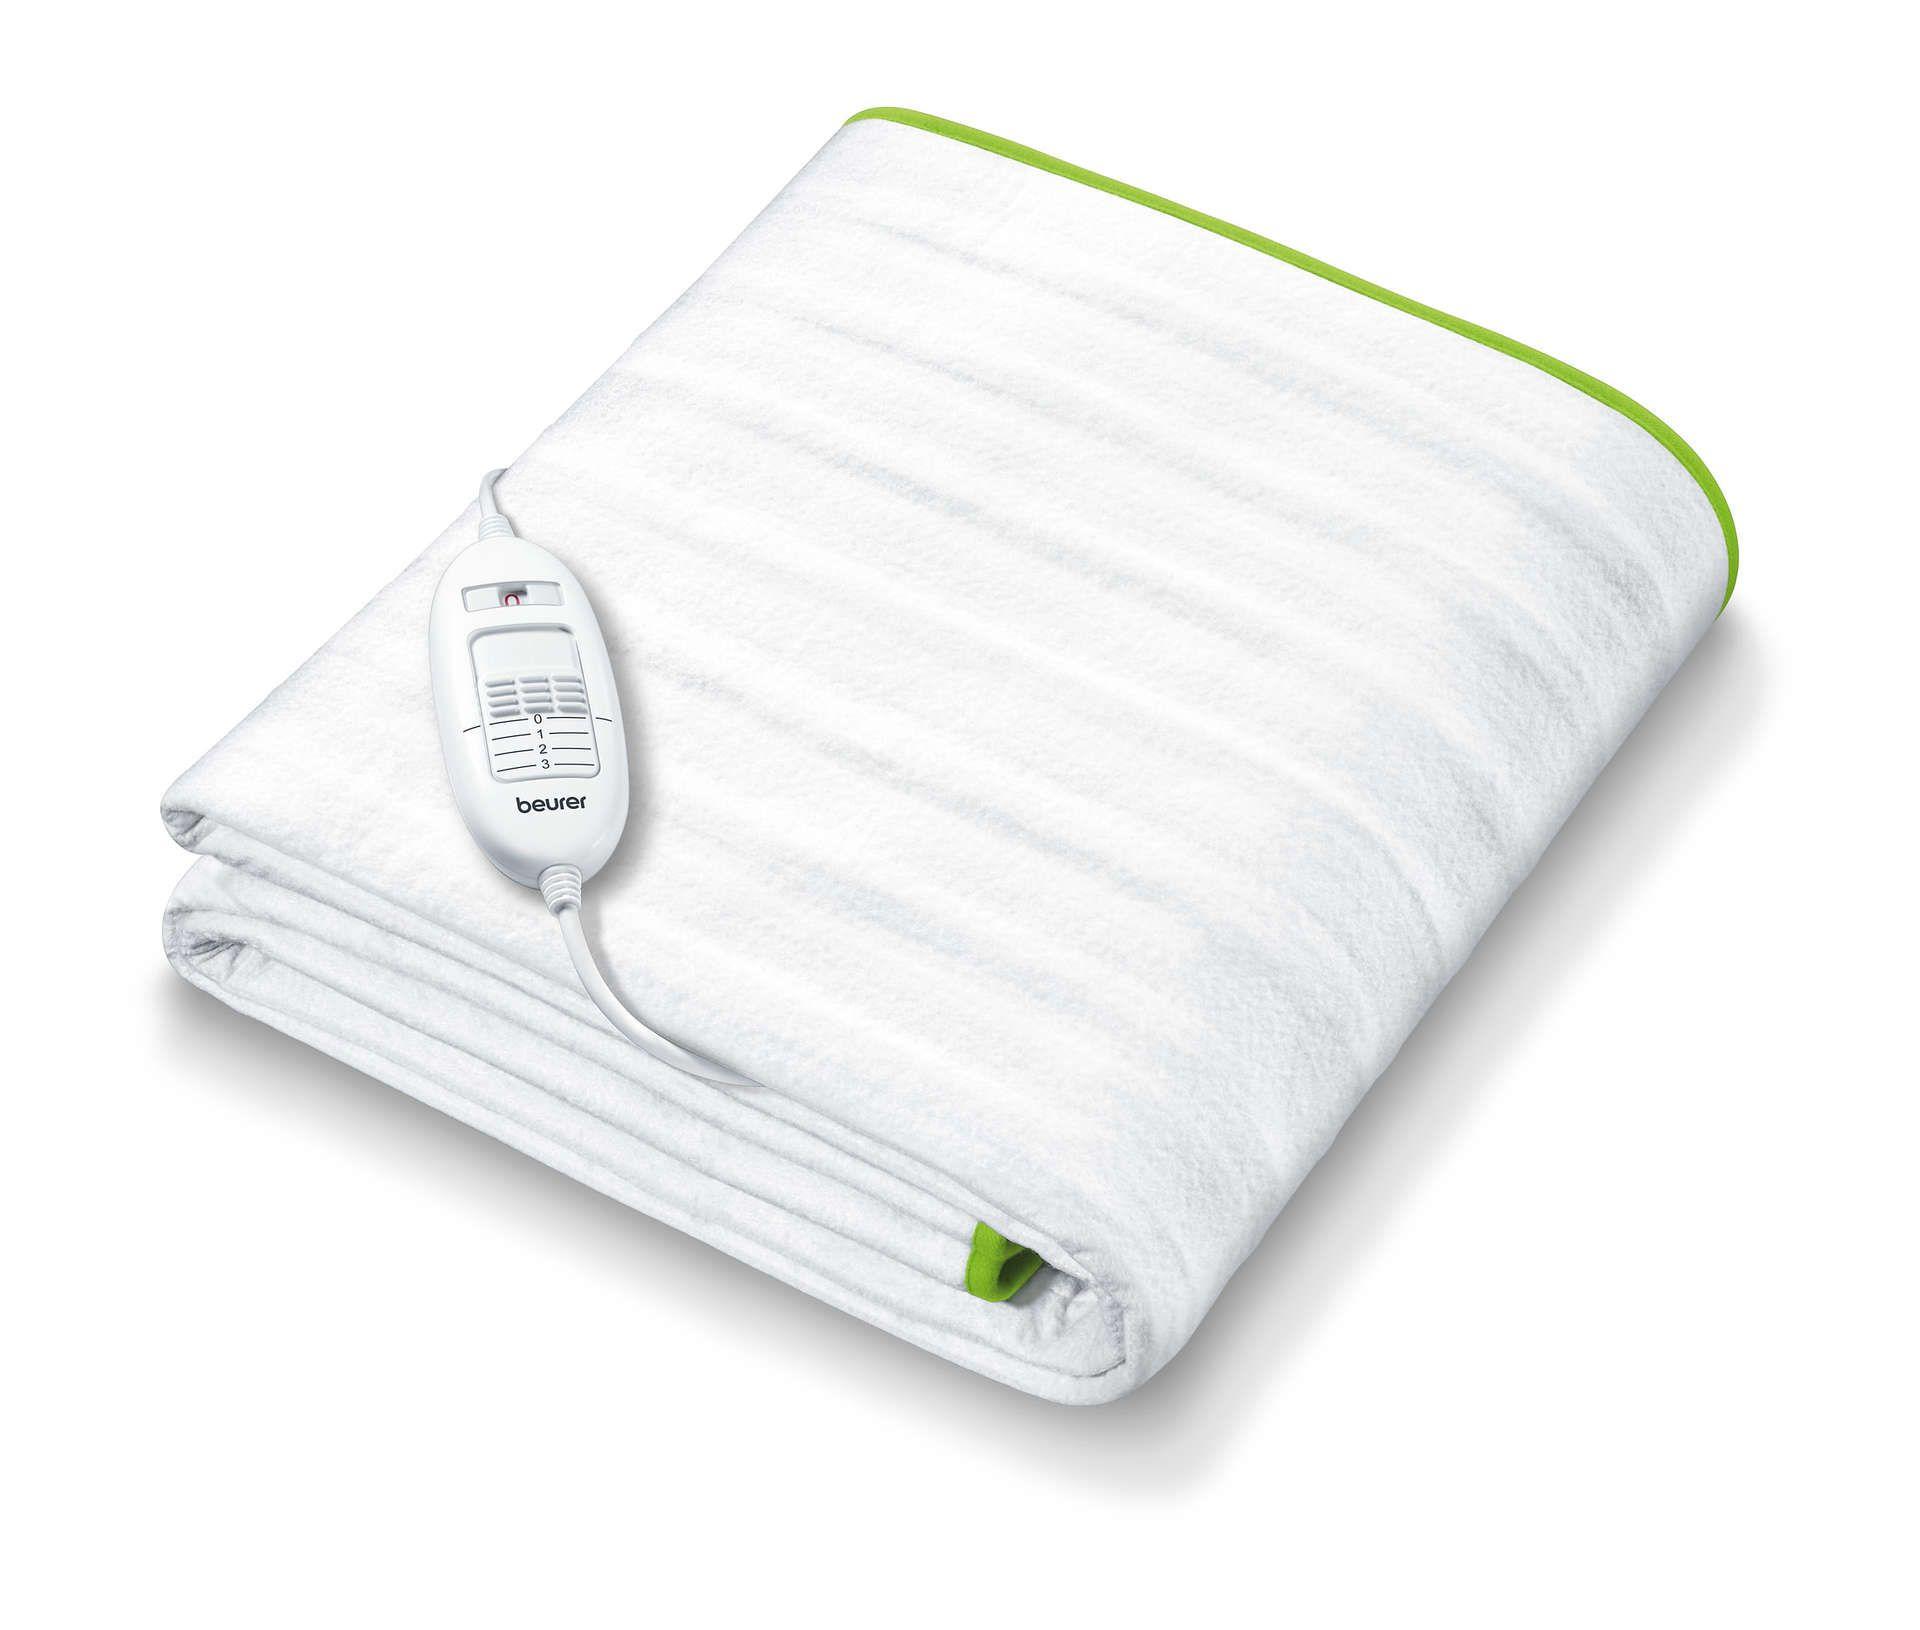 TS 15 Isıtmalı Yatak Altı